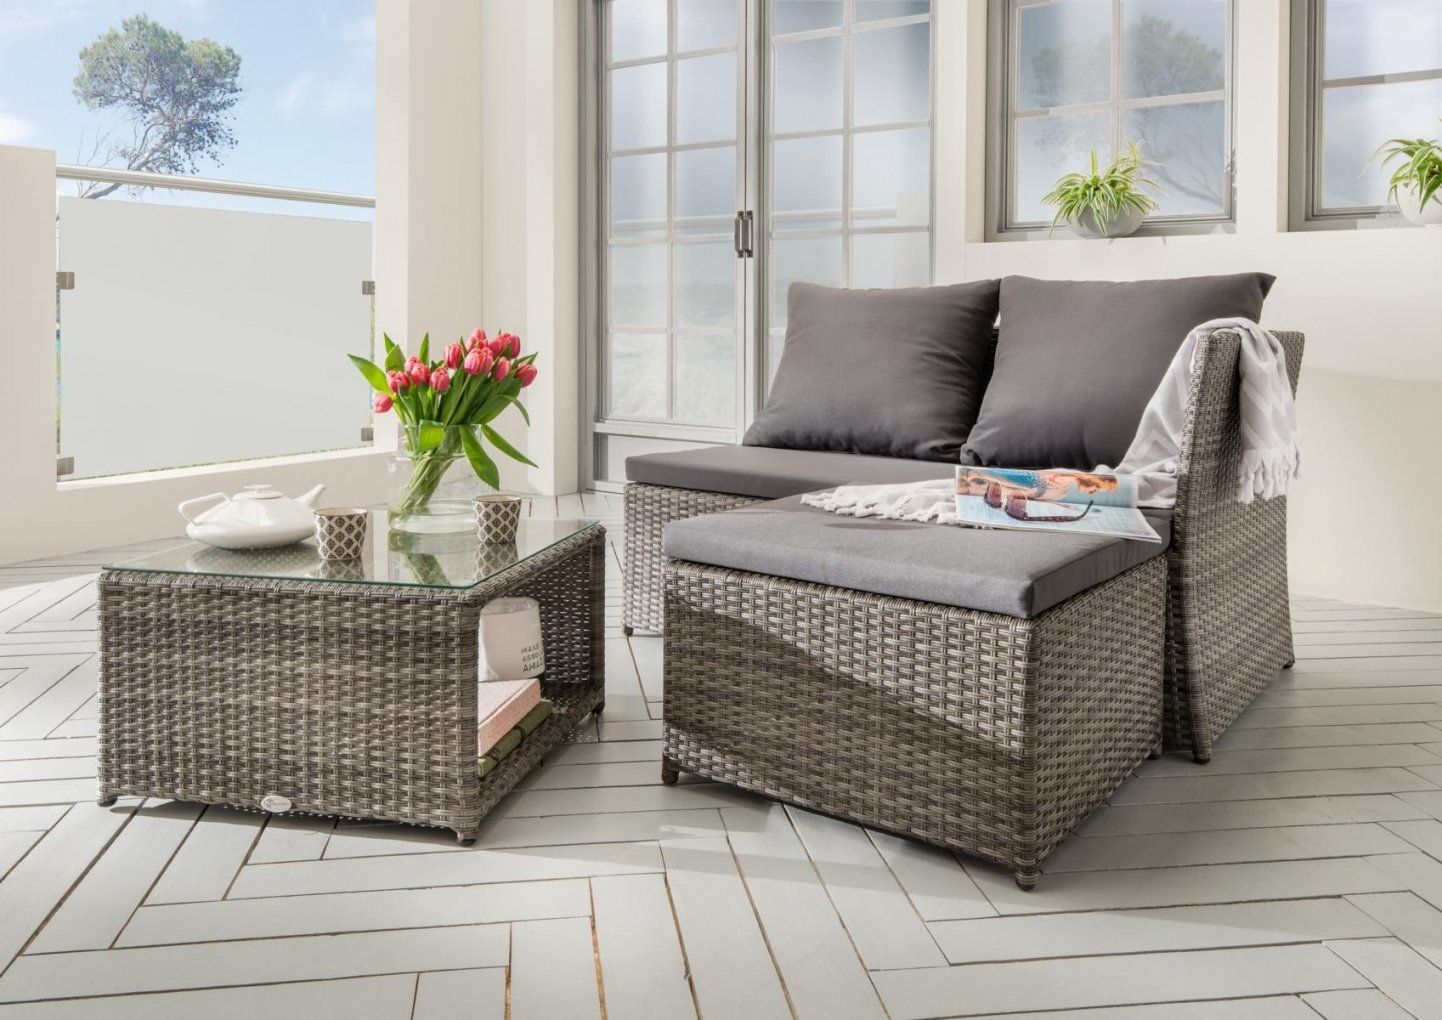 bemerkenswert lounge m bel f r kleinen balkon kleine balkone moebel von loungem bel f r kleinen. Black Bedroom Furniture Sets. Home Design Ideas